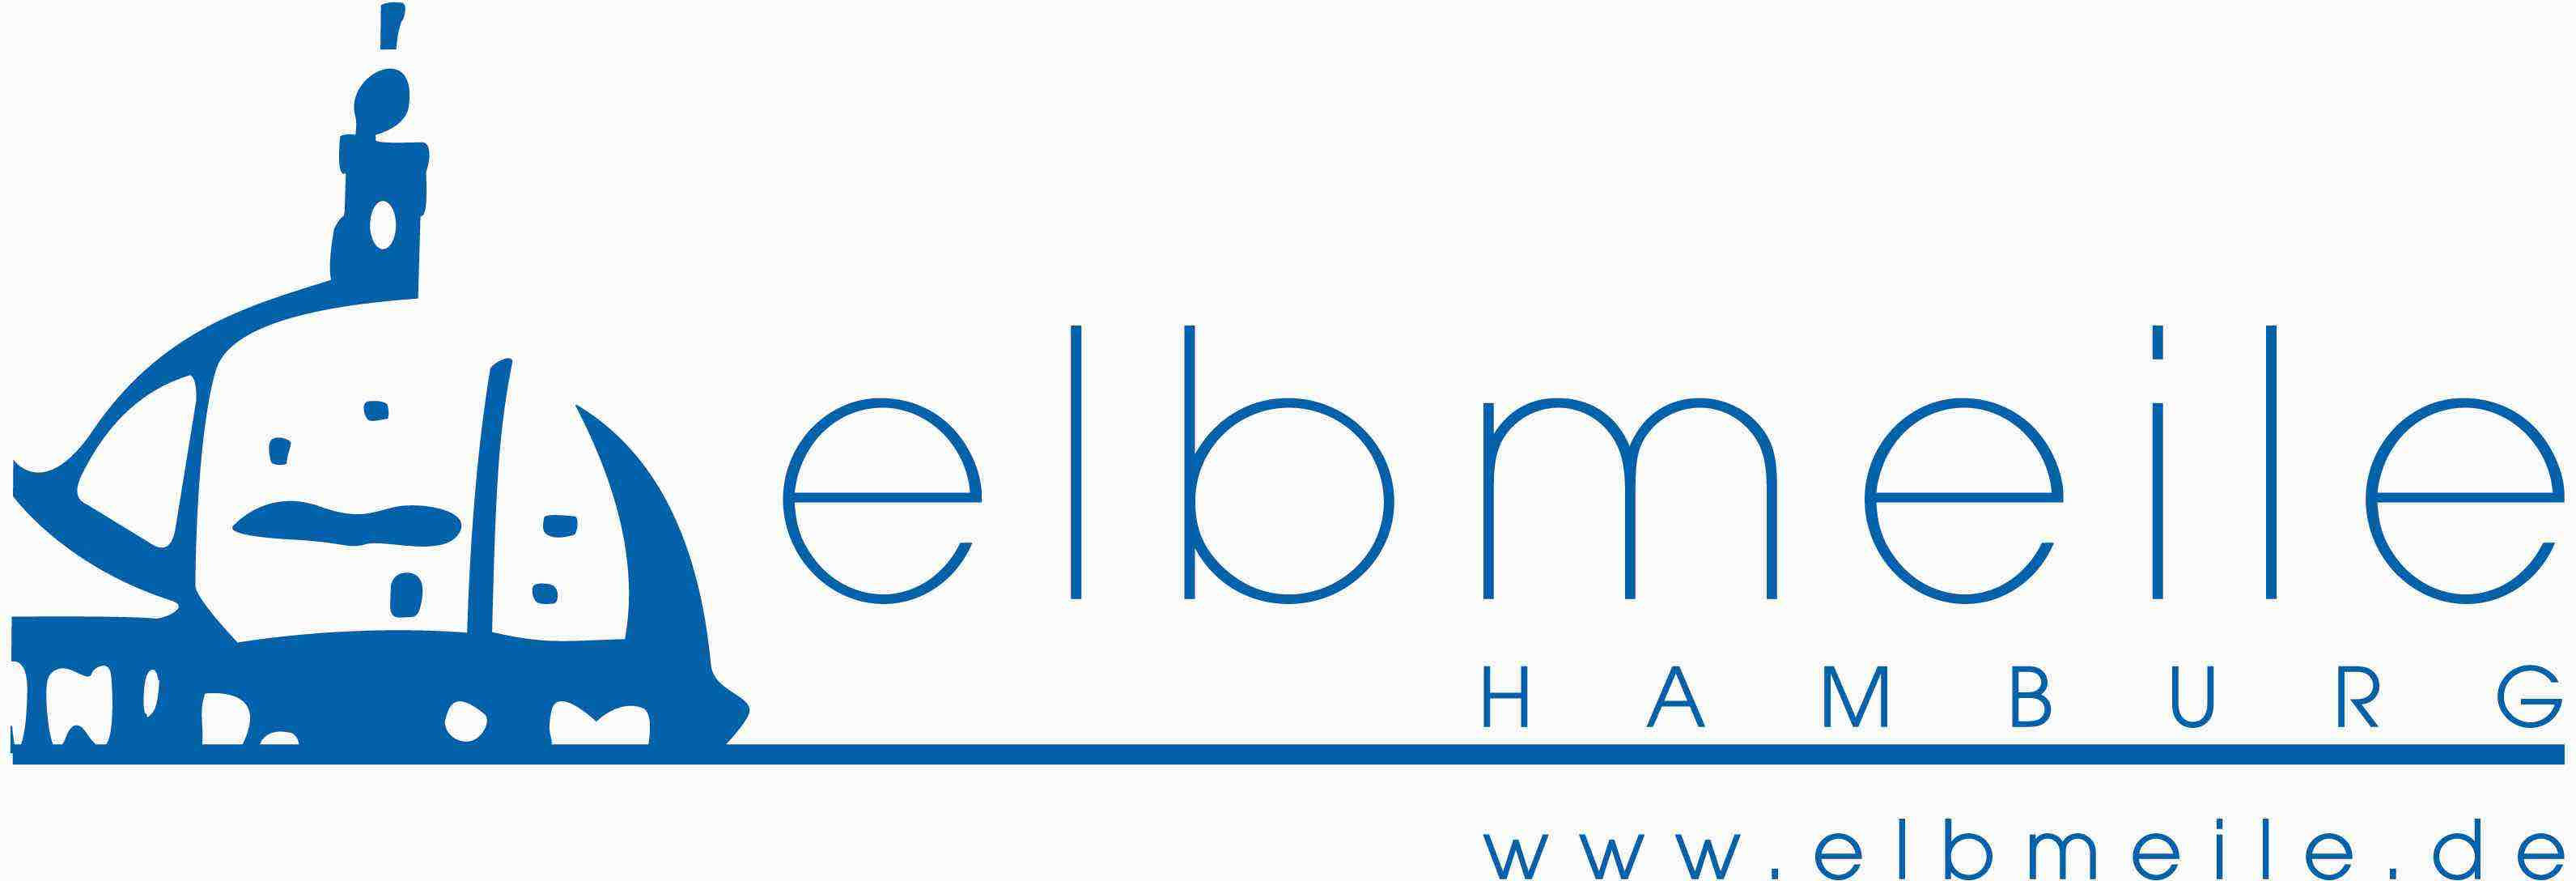 elbmeile_logo_RZ_low